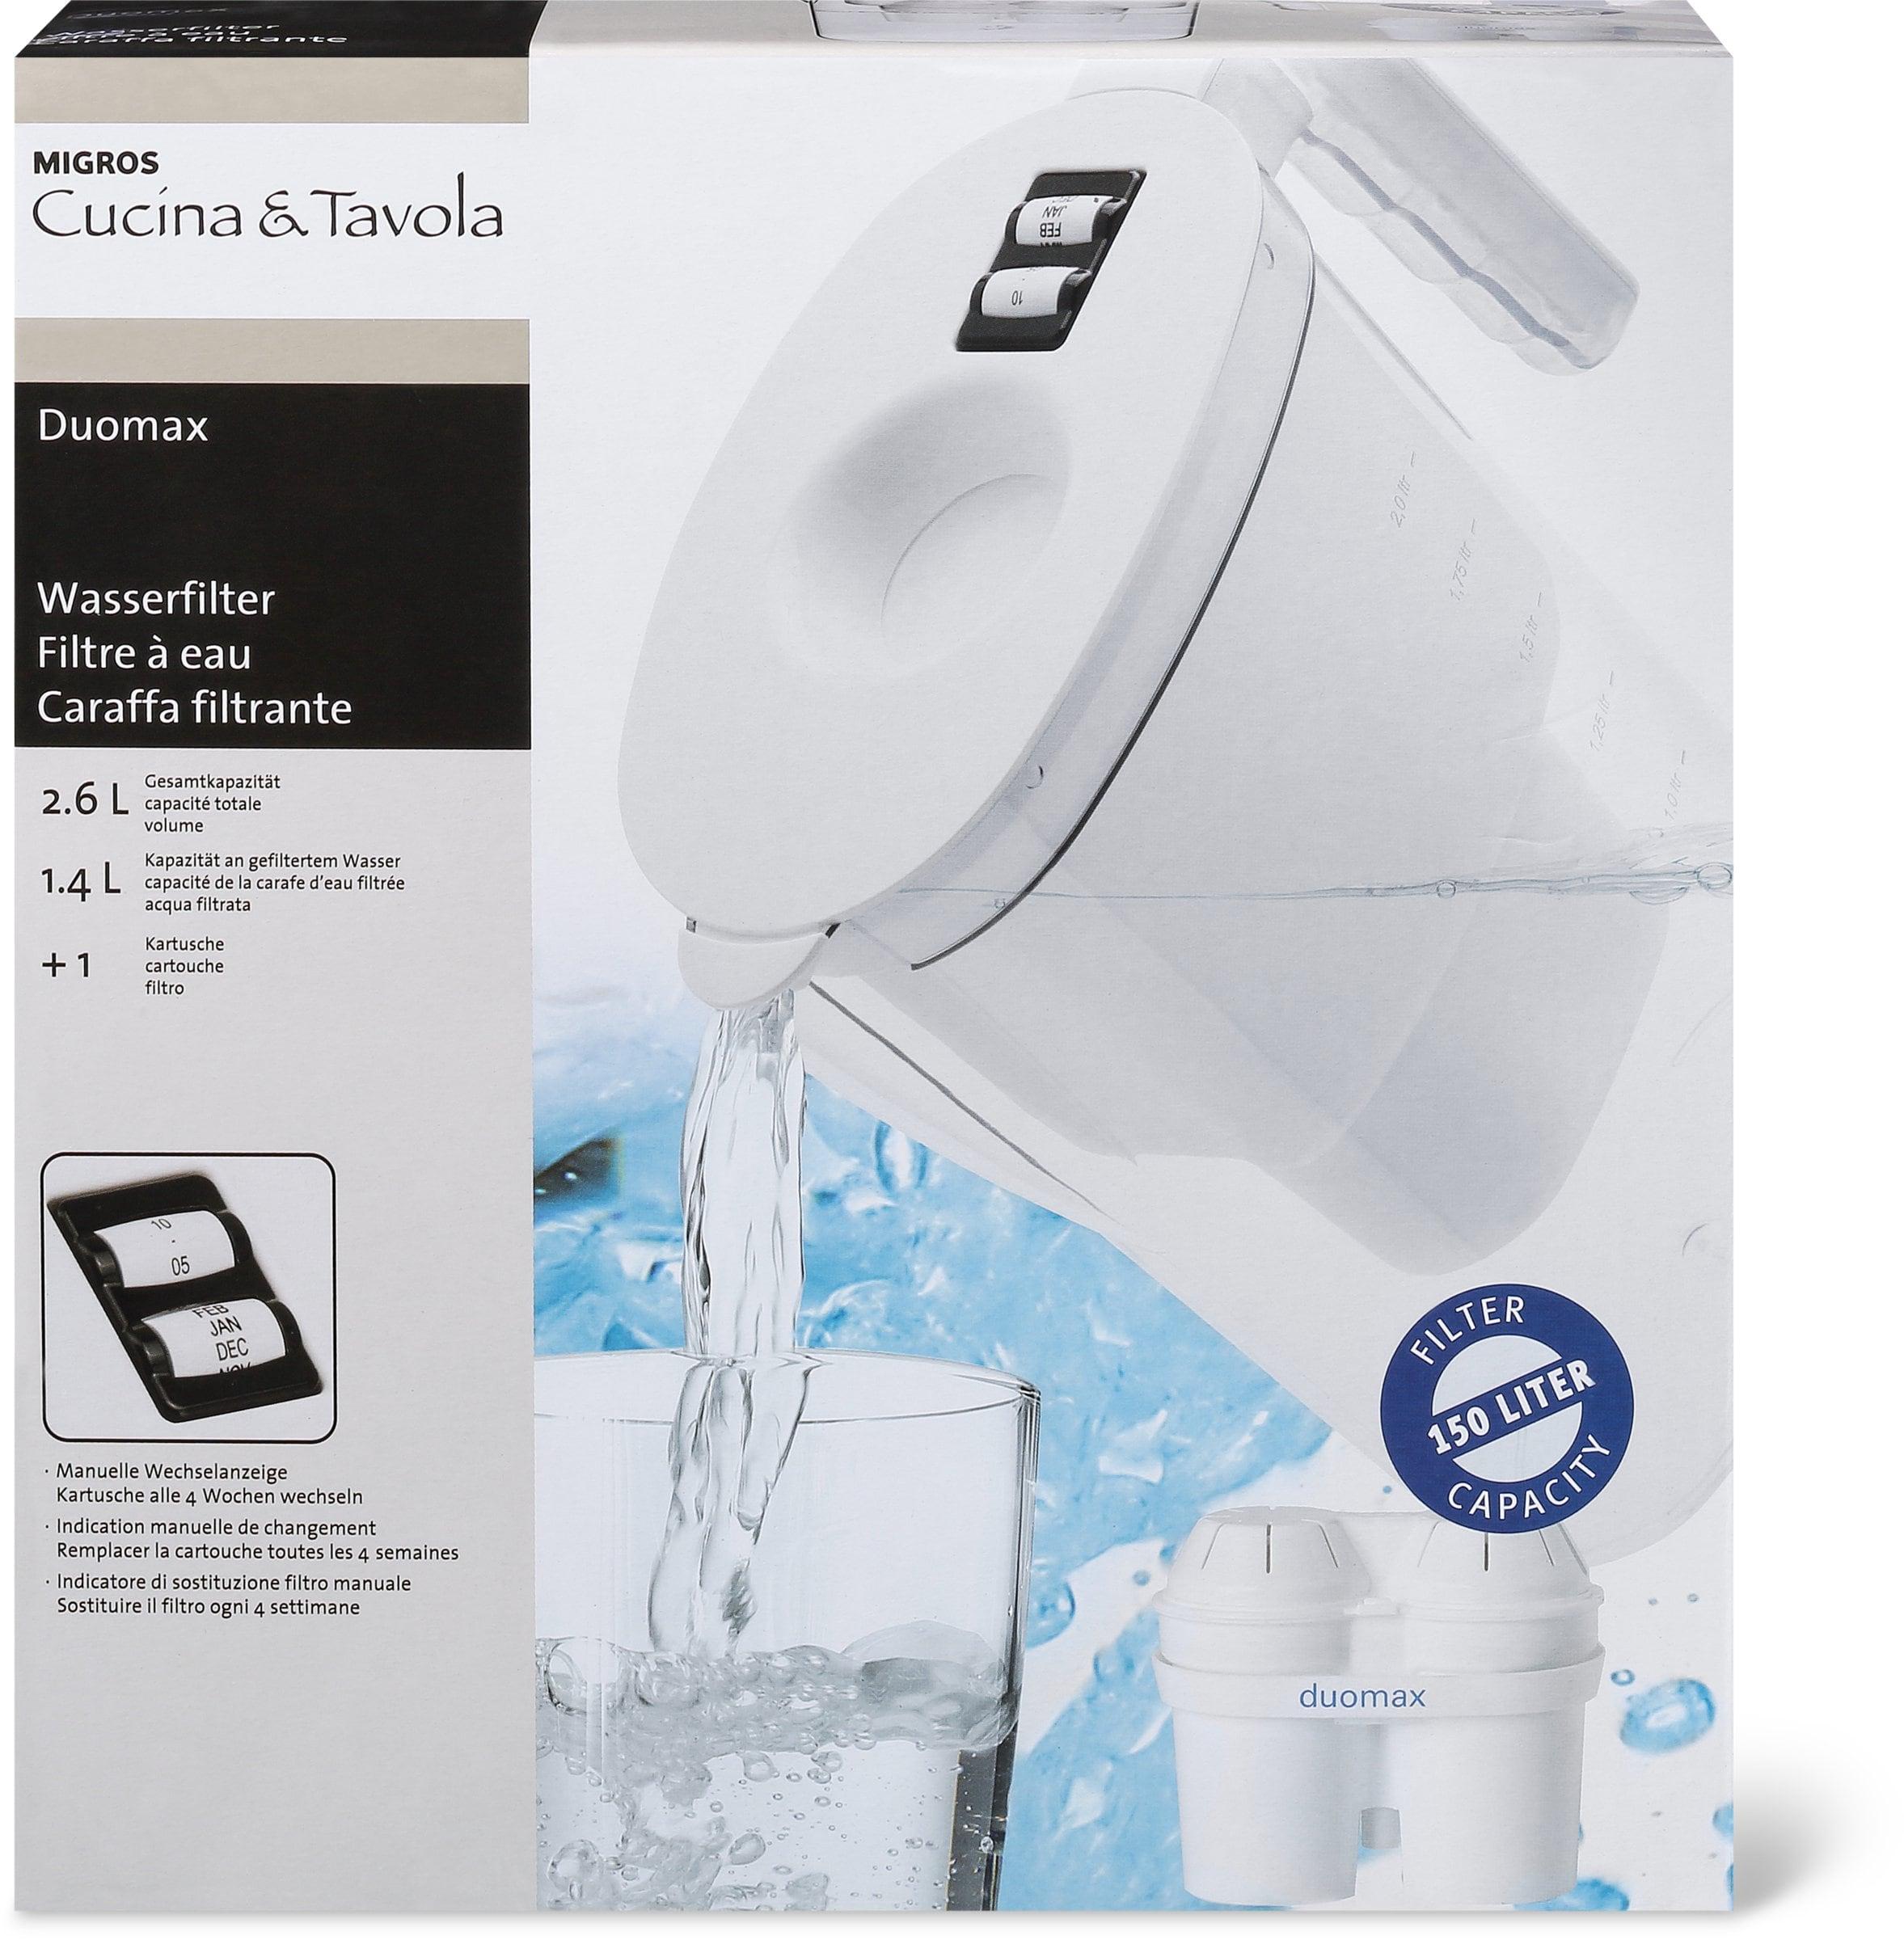 Cucina & Tavola CUCINA & TAVOLA Filtro per l'acqua